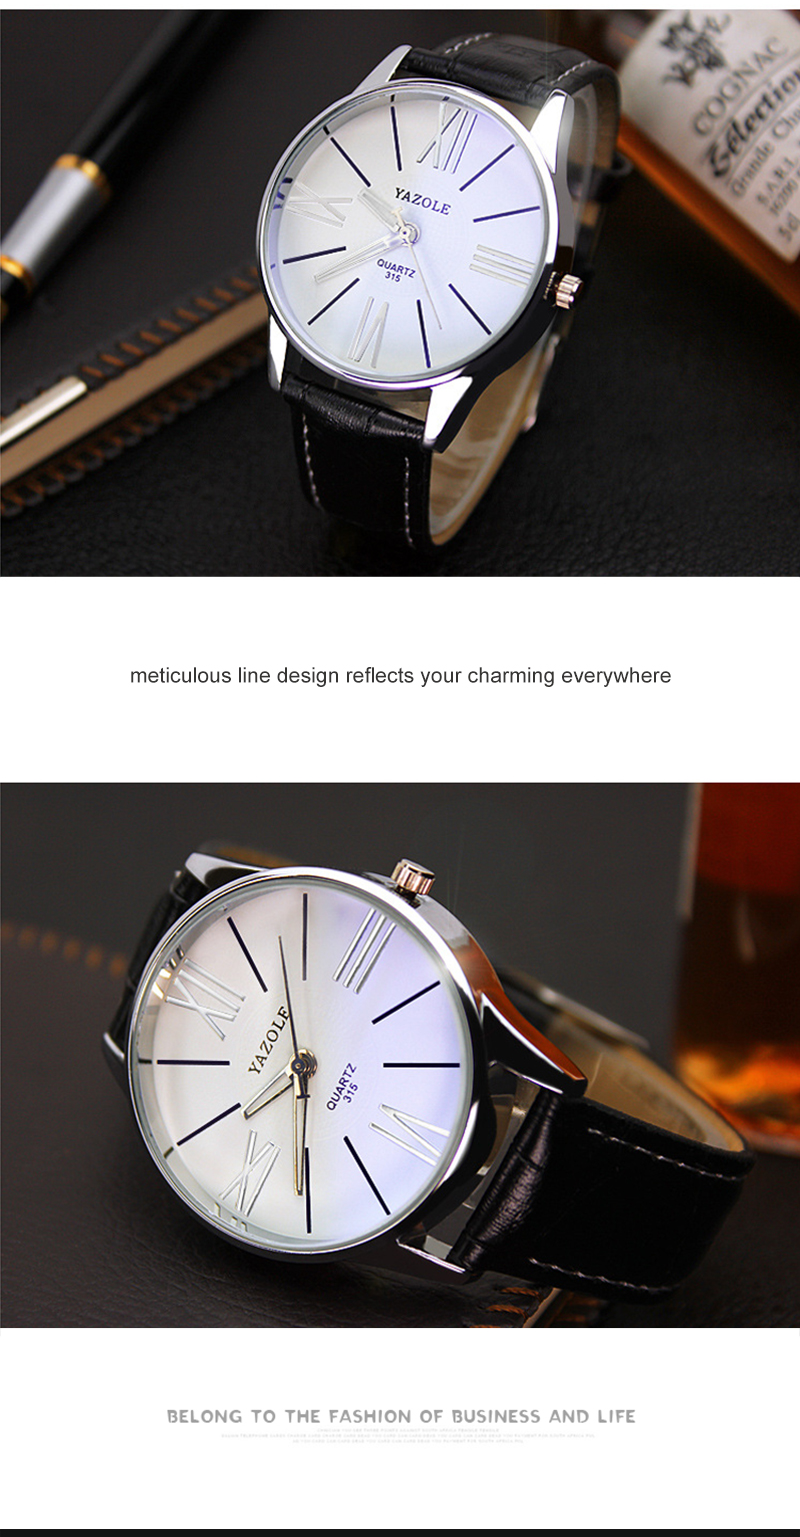 HTB1KGIqSpXXXXXWXVXXq6xXFXXXc - Mens Watches Top Brand Luxury 2018 Yazole Watch Men Fashion Business Quartz-watch Minimalist Belt Male Watches Relogio Masculino